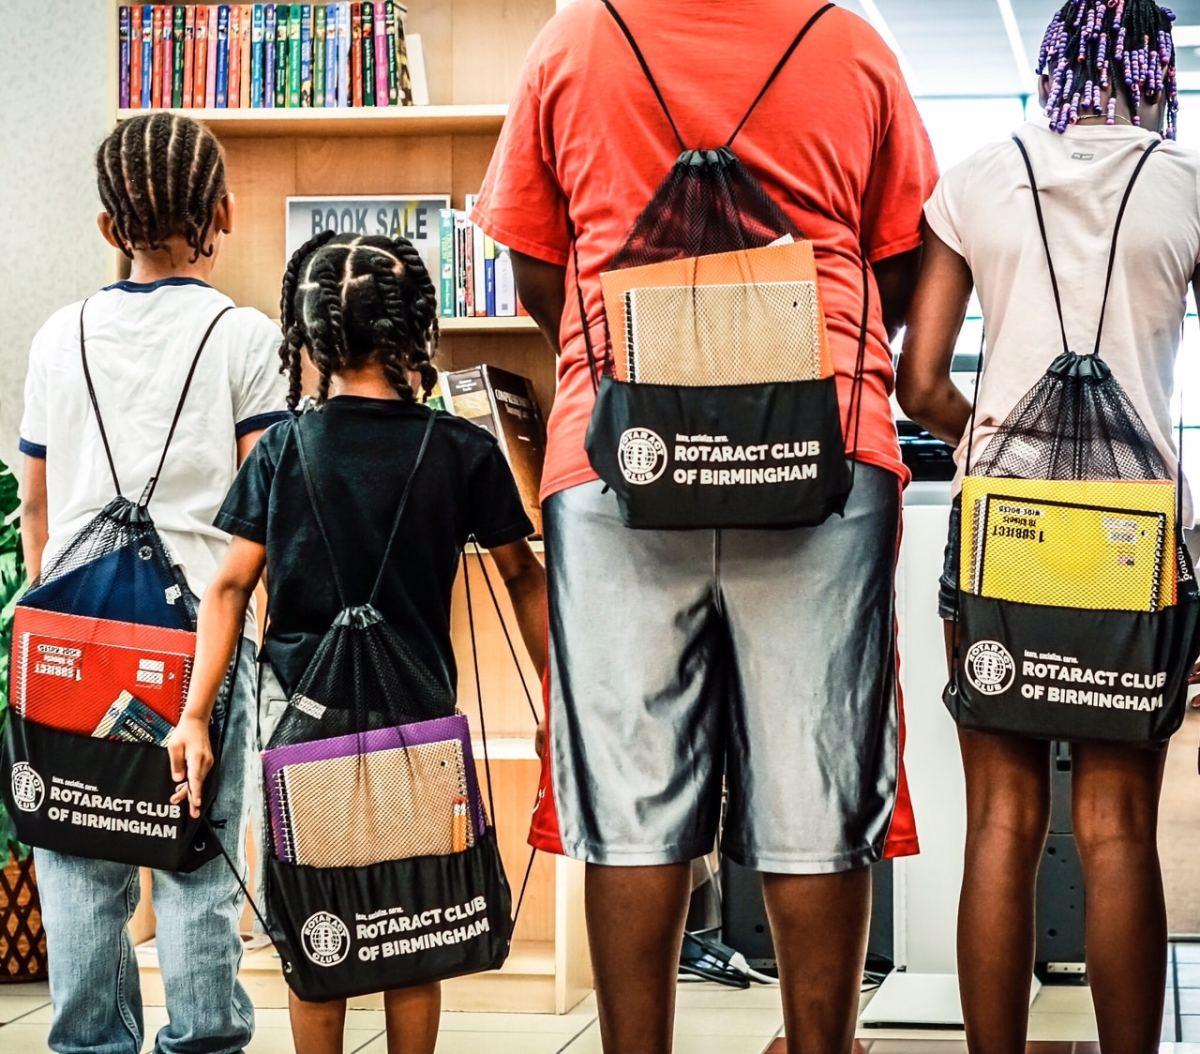 Don't miss The Rotaract Club of Birmingham school supplies giveaway